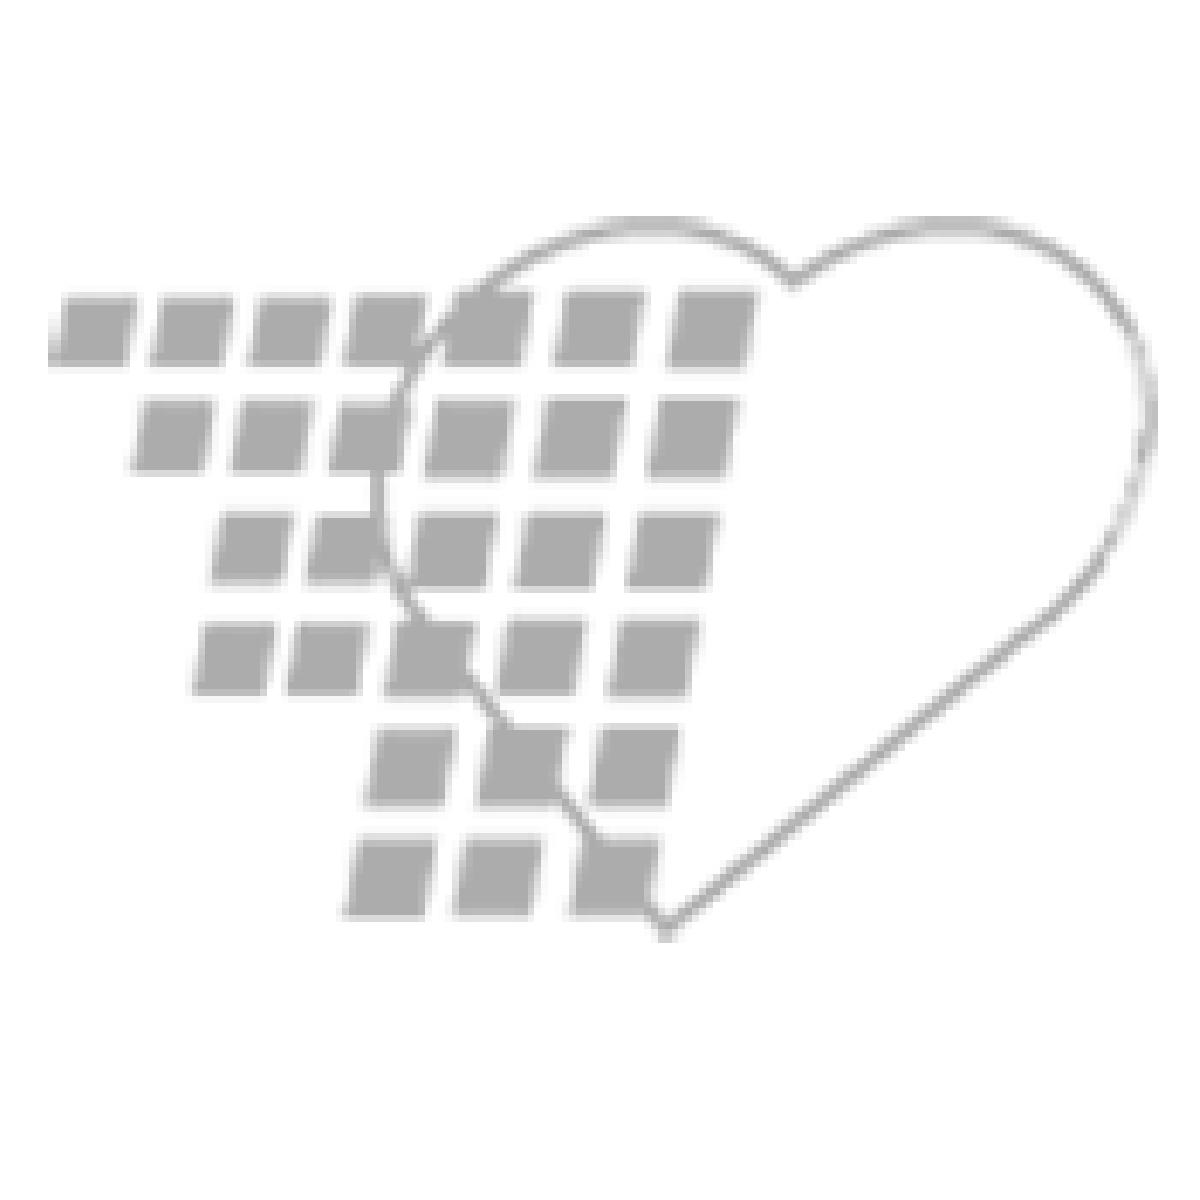 02-49-6611 - Gastroccult® Test Developer Bottle - 15mL